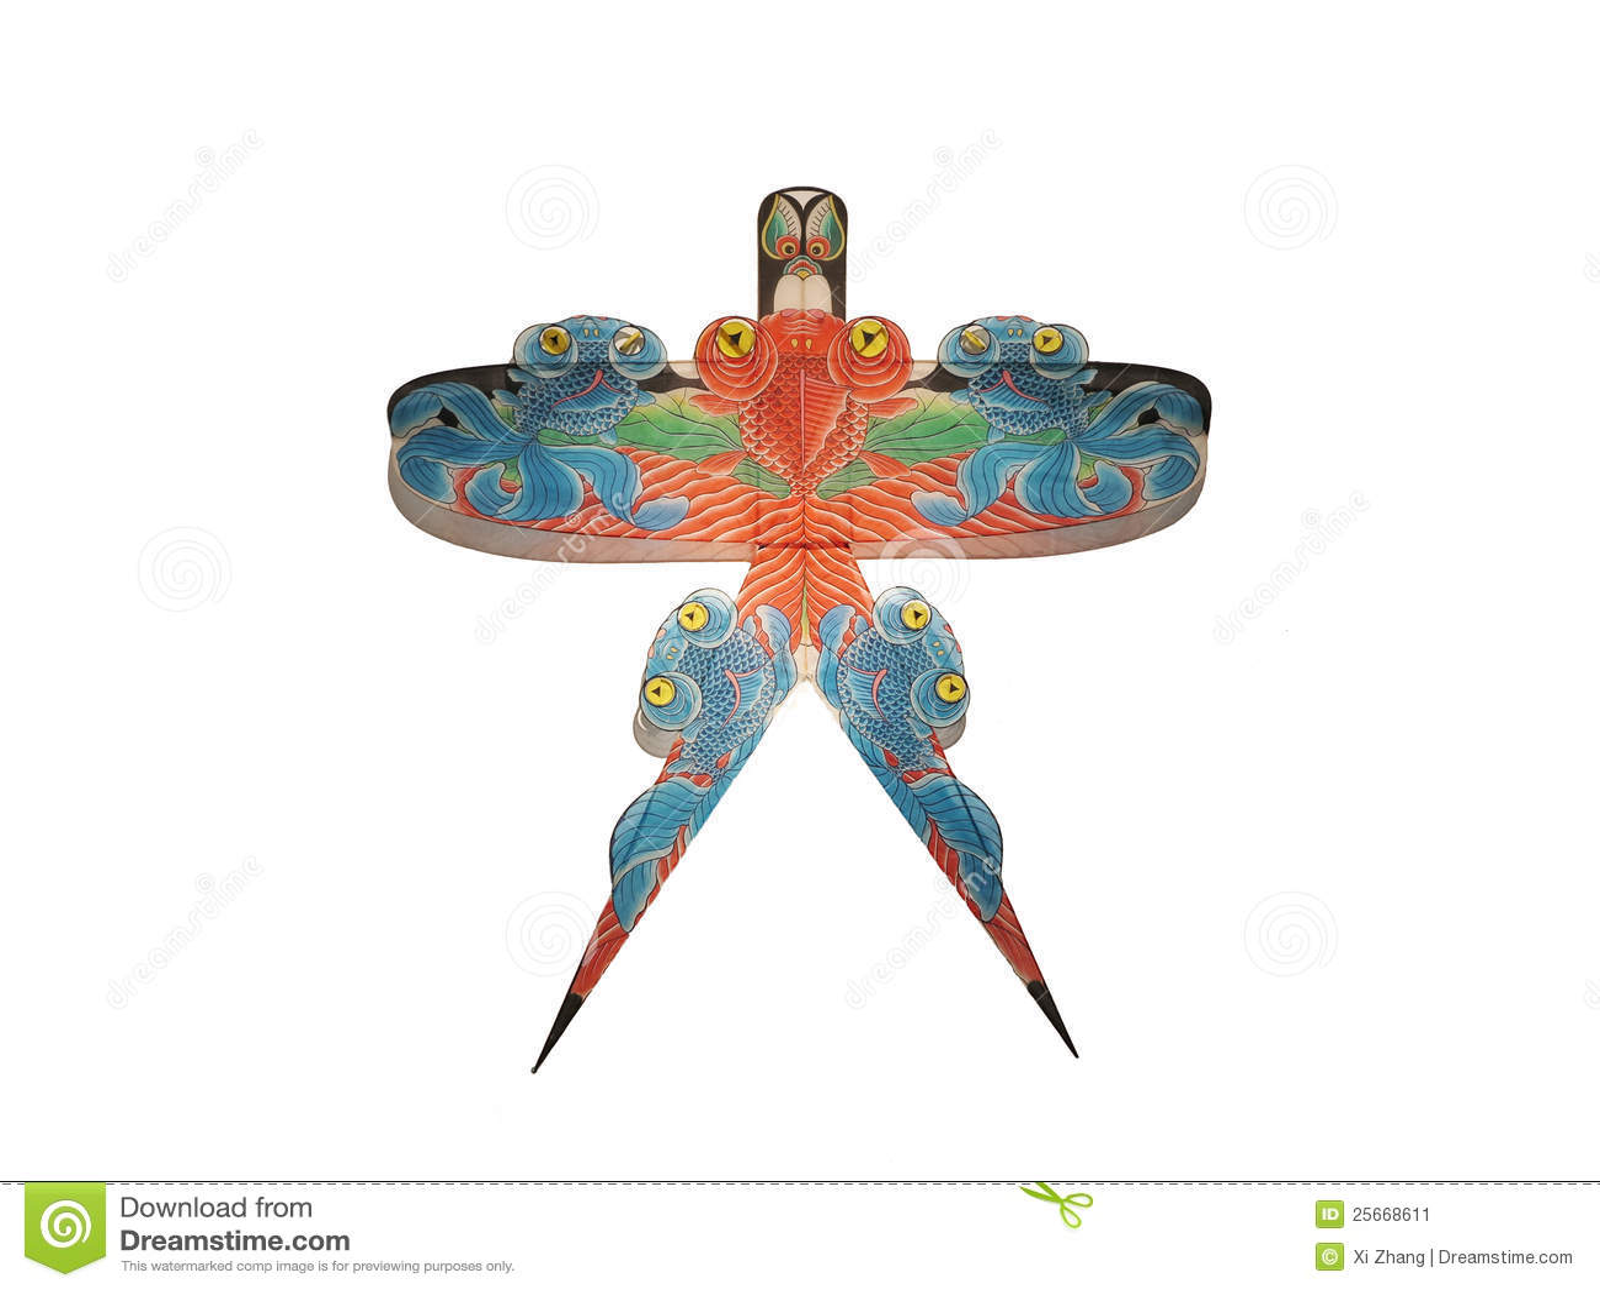 dessin sur le cerf volant traditionnel chinois image stock image 25668611. Black Bedroom Furniture Sets. Home Design Ideas